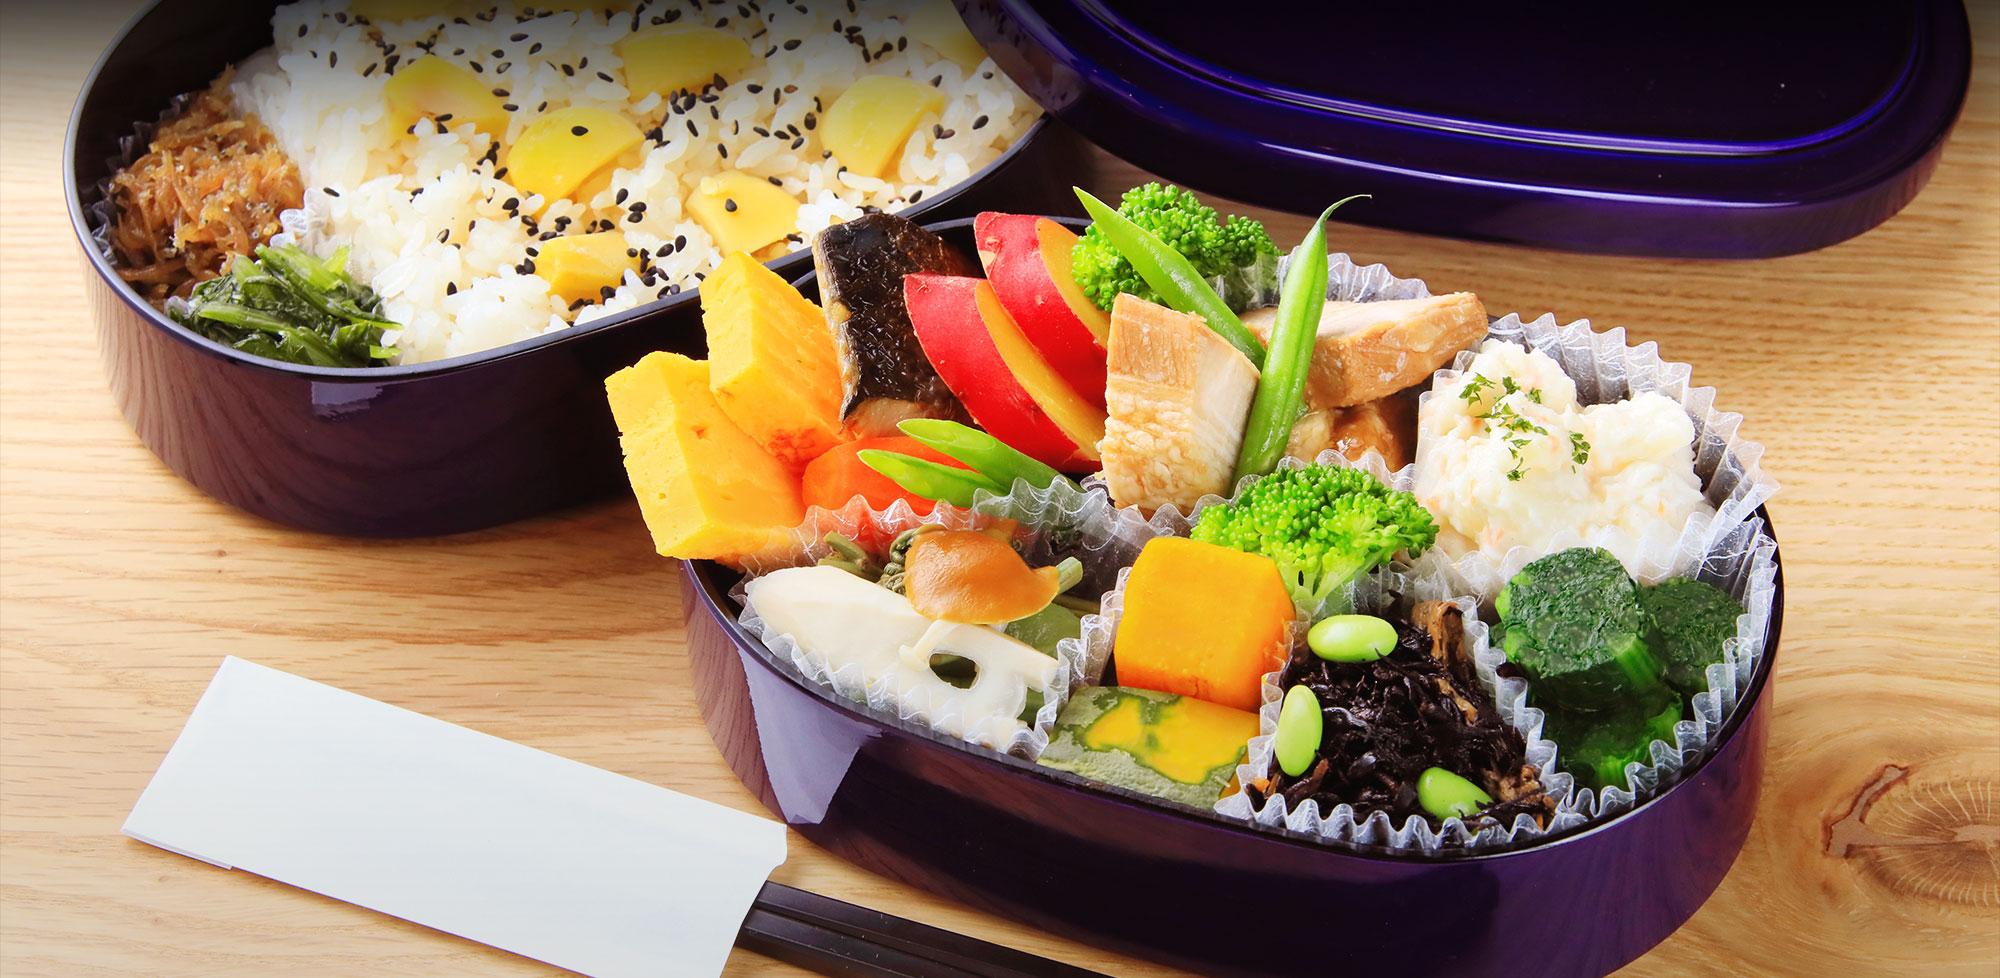 BREAKFAST 京都を感じる朝食